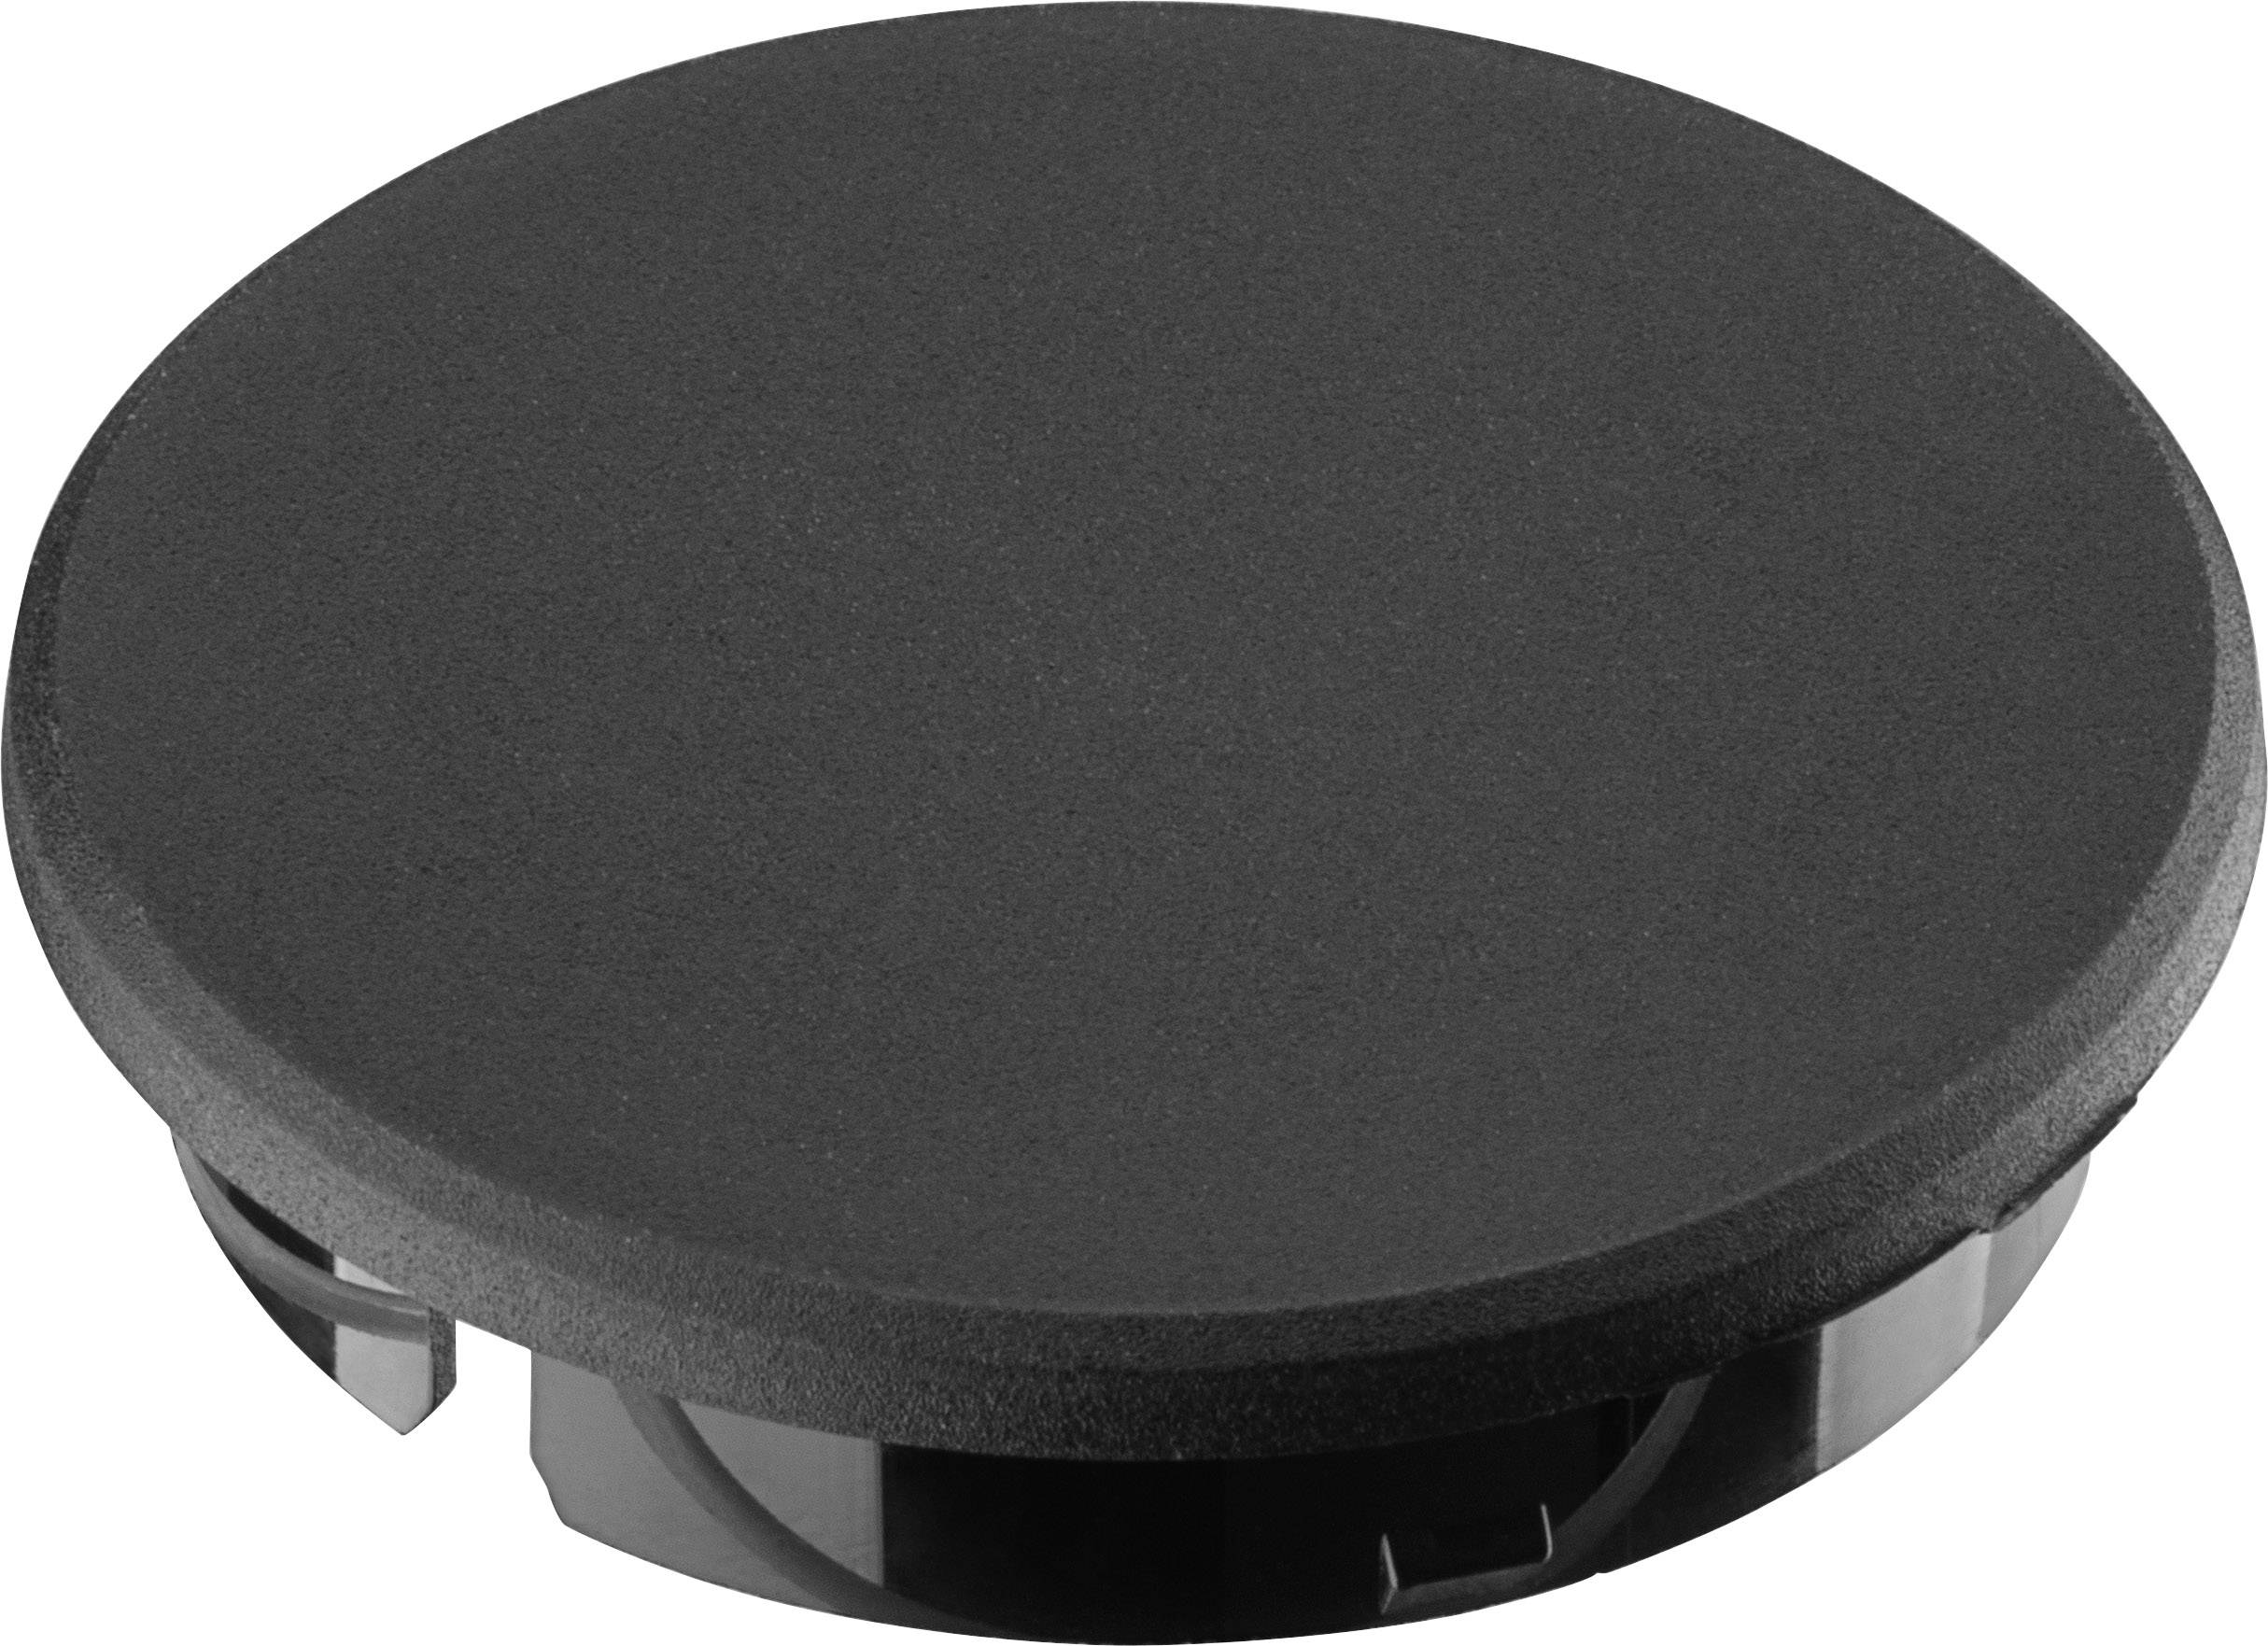 Krytka knoflíku Ritel 30 36 10 3 28.3 mm, černá, 1 ks